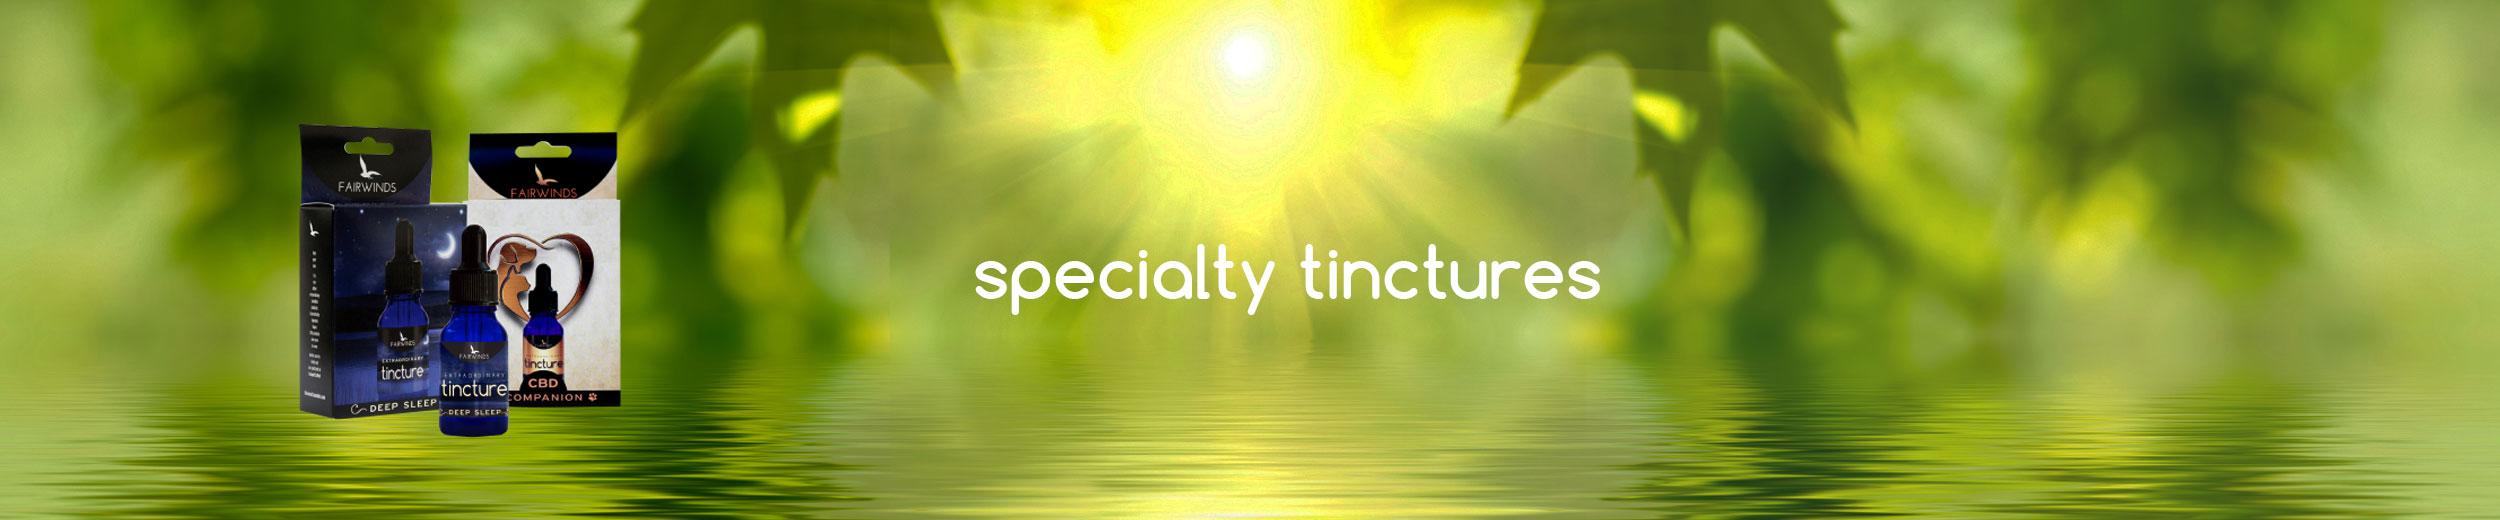 specialty-tinctures2